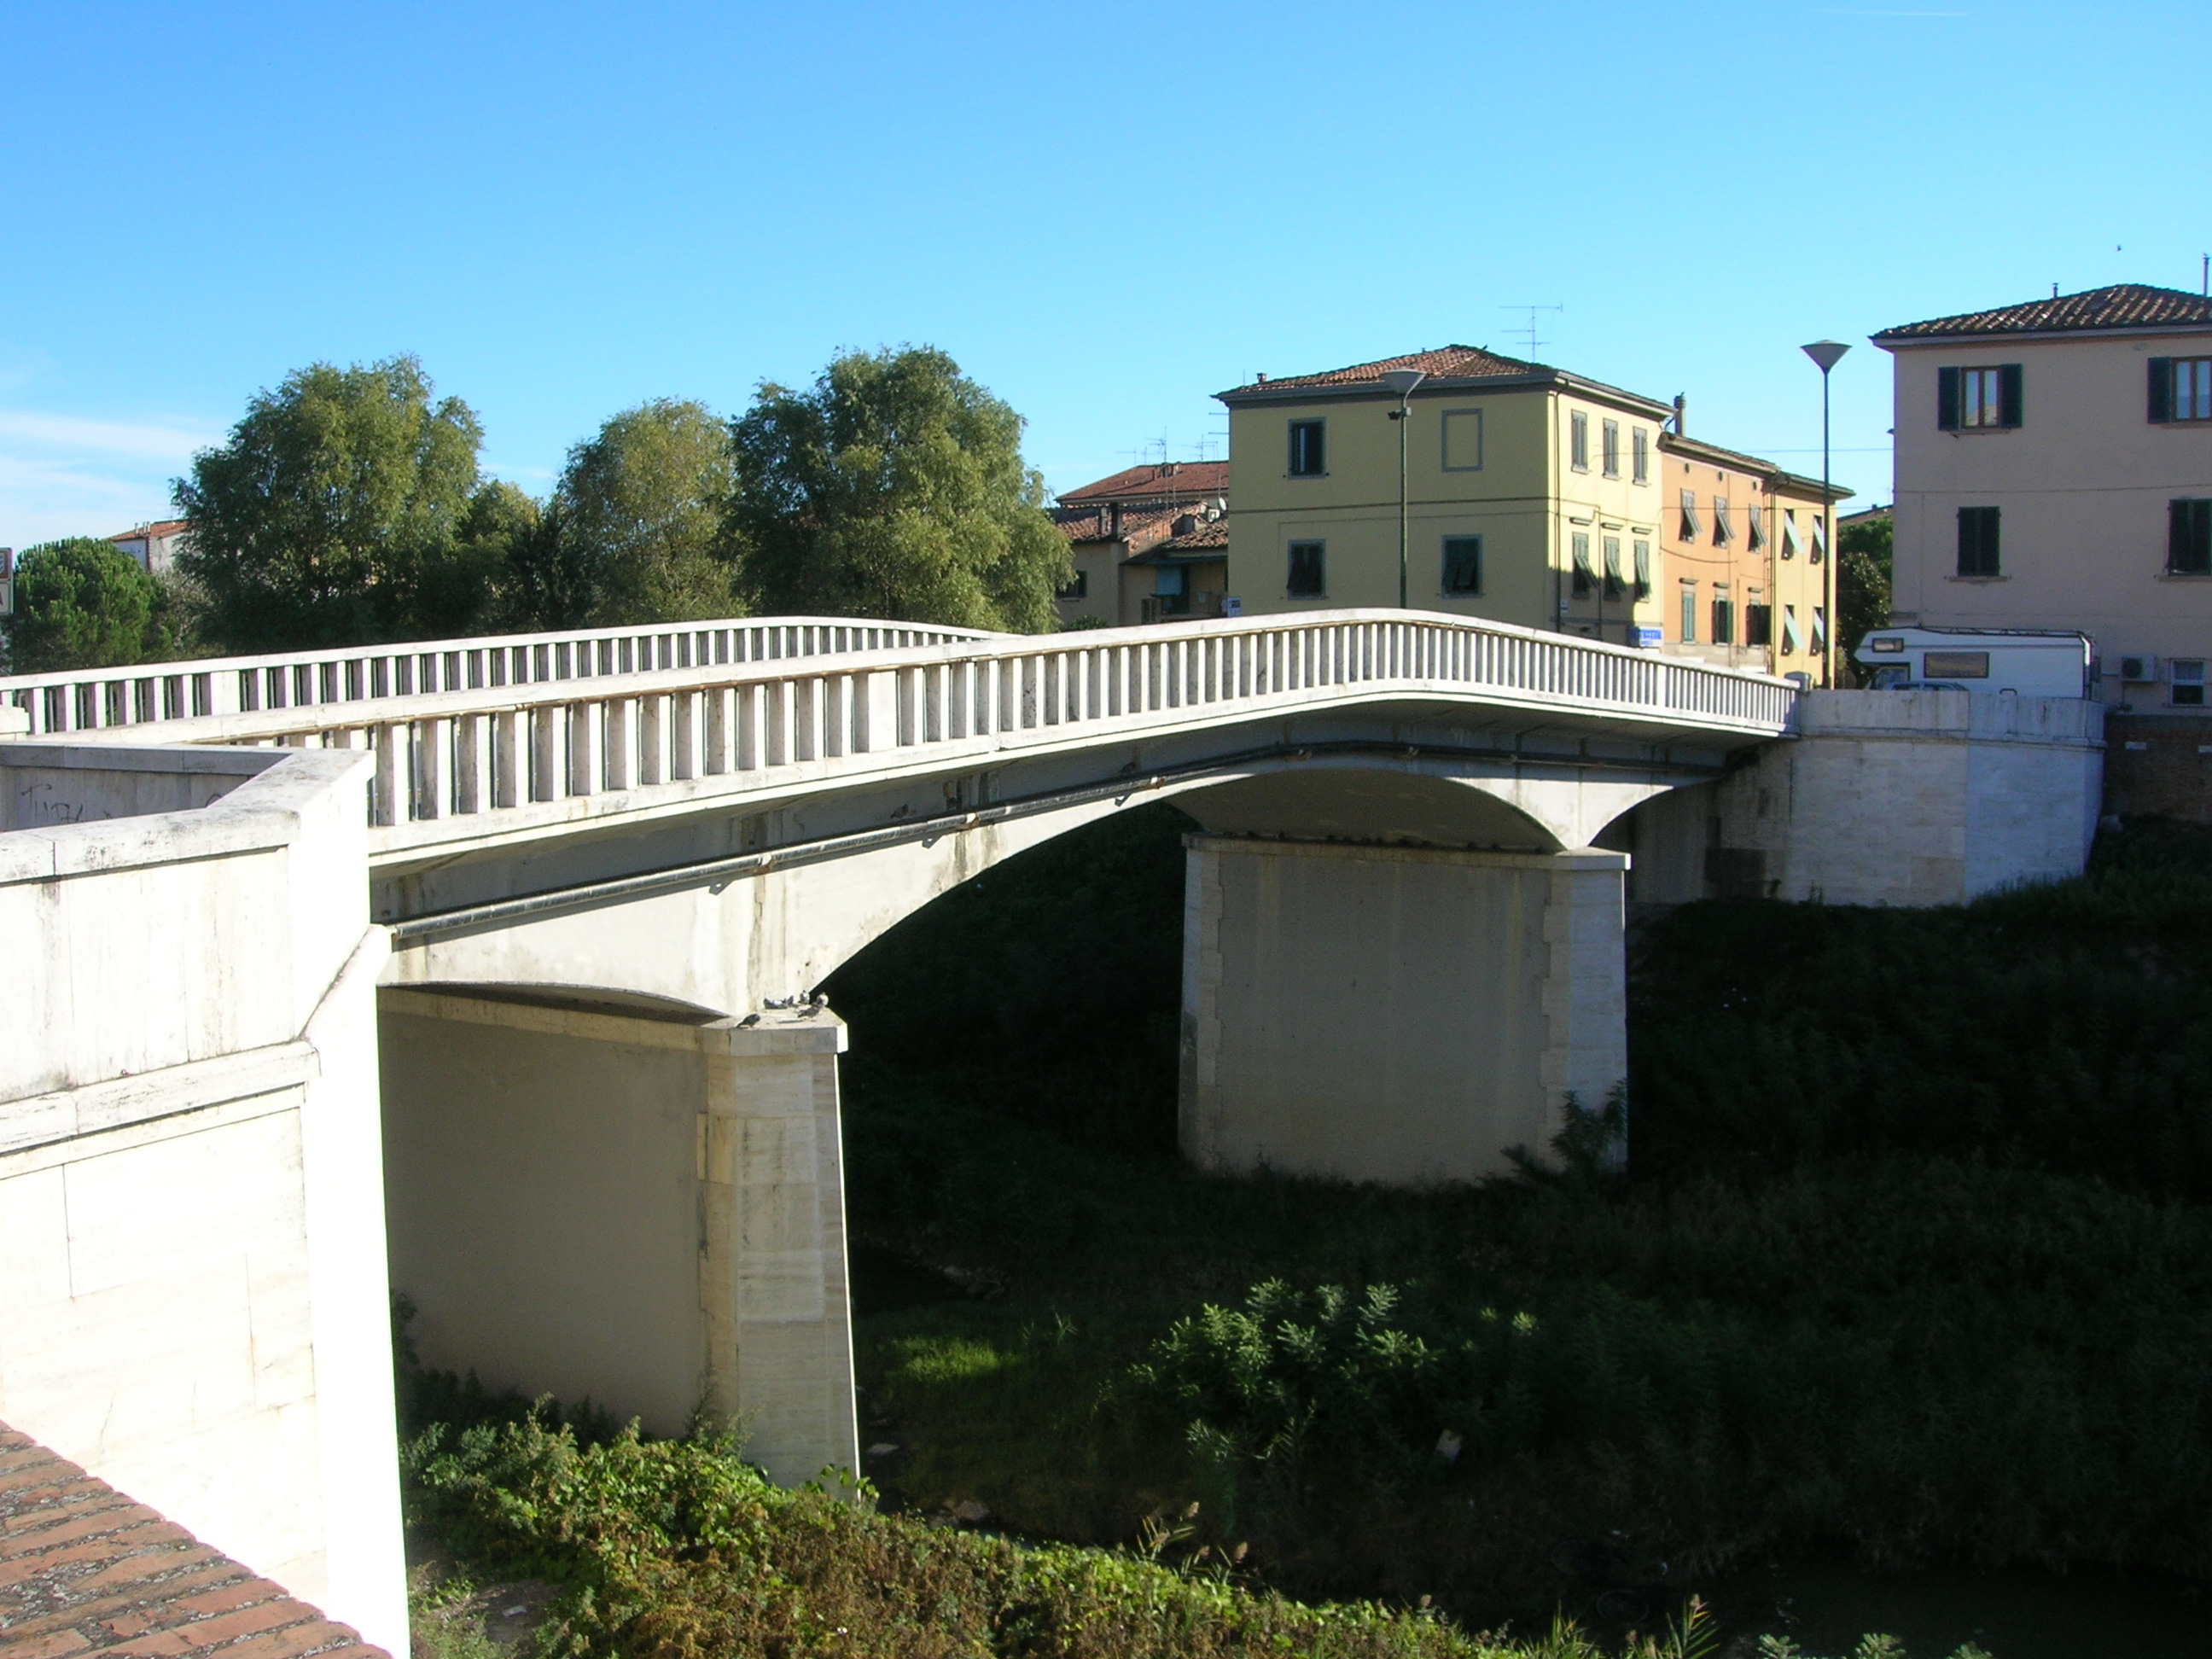 Pontedera Italy  city photos gallery : Pontedera Ponte napoleonico visto da sud Wikipedia, the ...